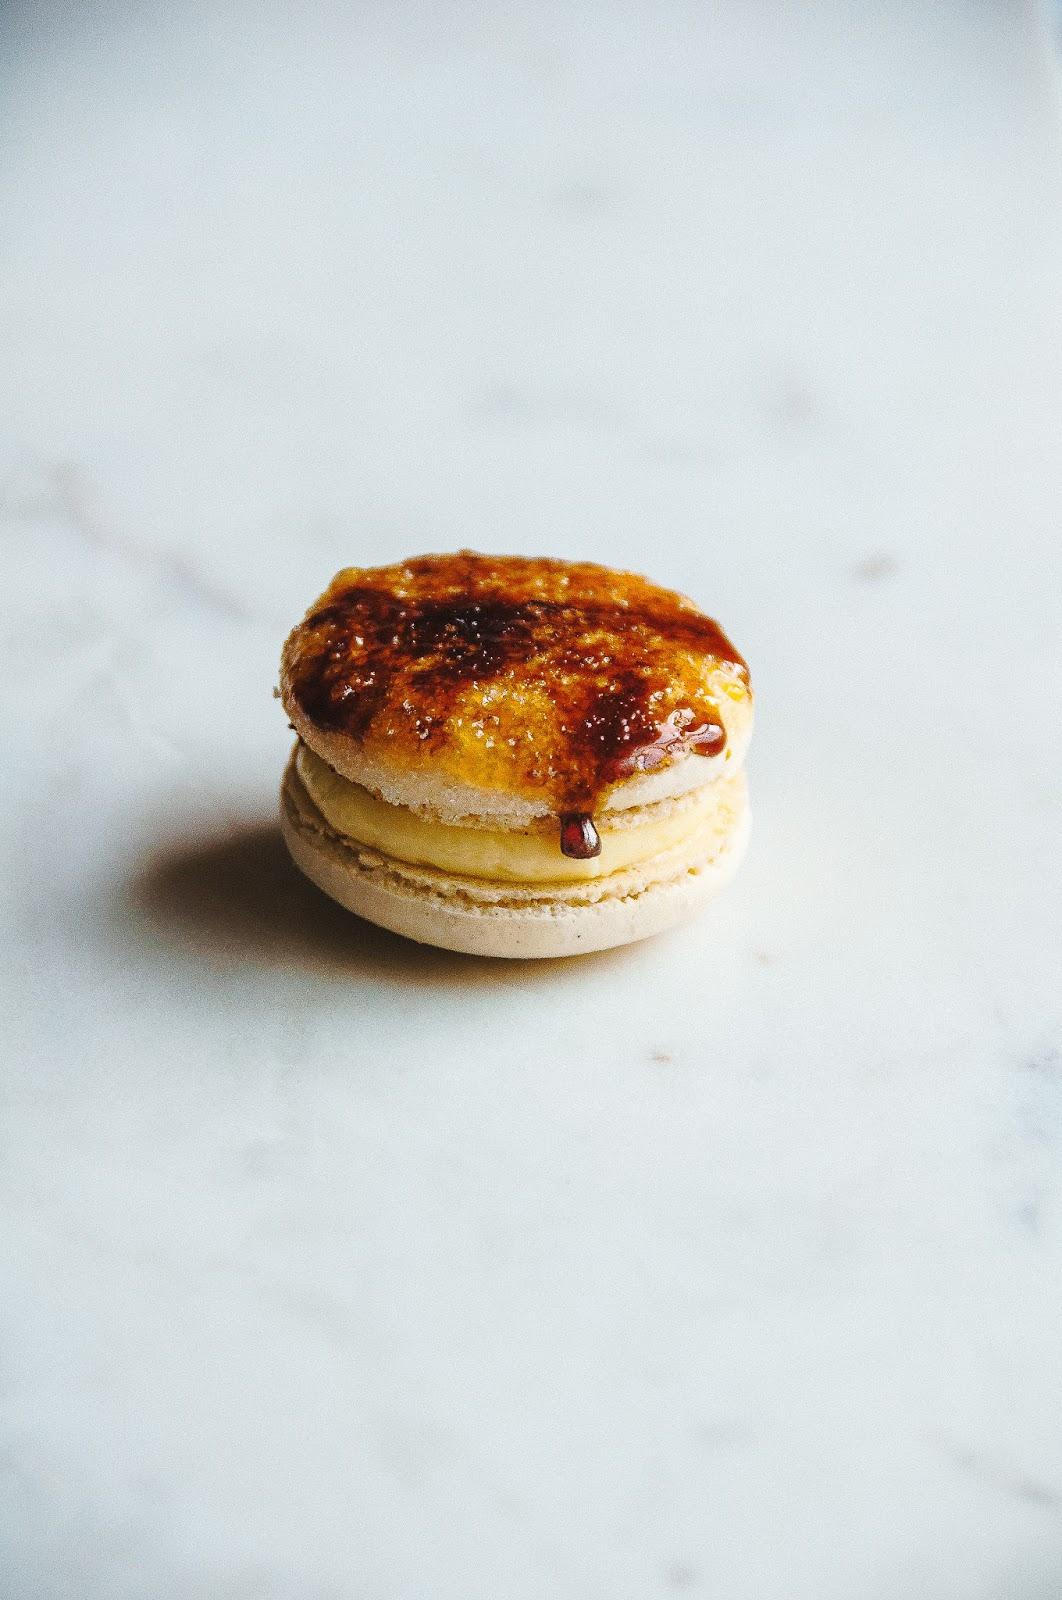 ... Delicious Recipe, Creme Brulee, Delicious Cookies, Cookies Balls Bit